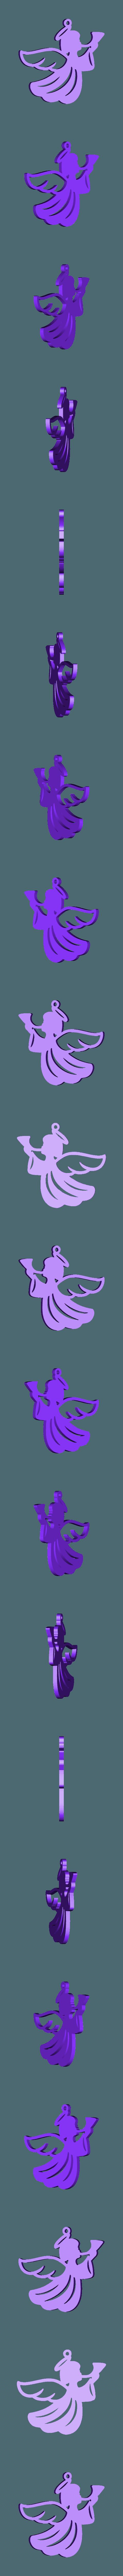 Agelito 2.stl Download STL file key chain angel • 3D printing design, abauerenator